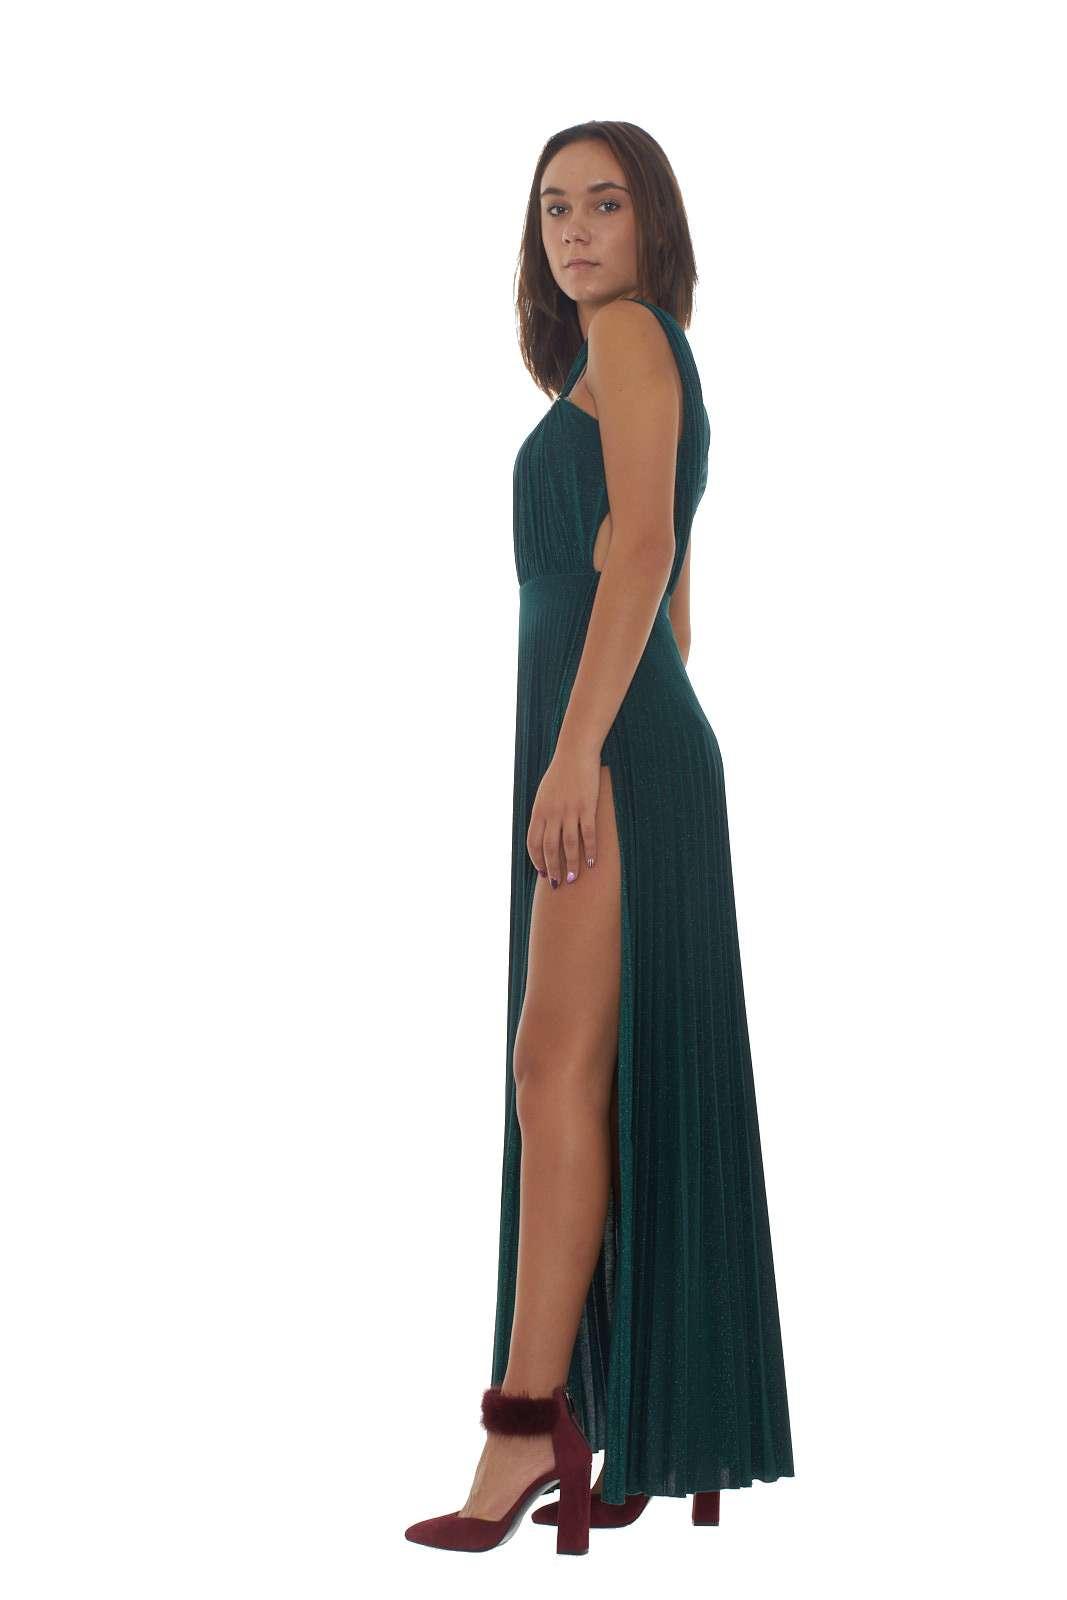 https://www.parmax.com/media/catalog/product/a/i/AI-outlet_parmax-abito-donna-Elisabetta-Franchi-AB91096E2-B.jpg